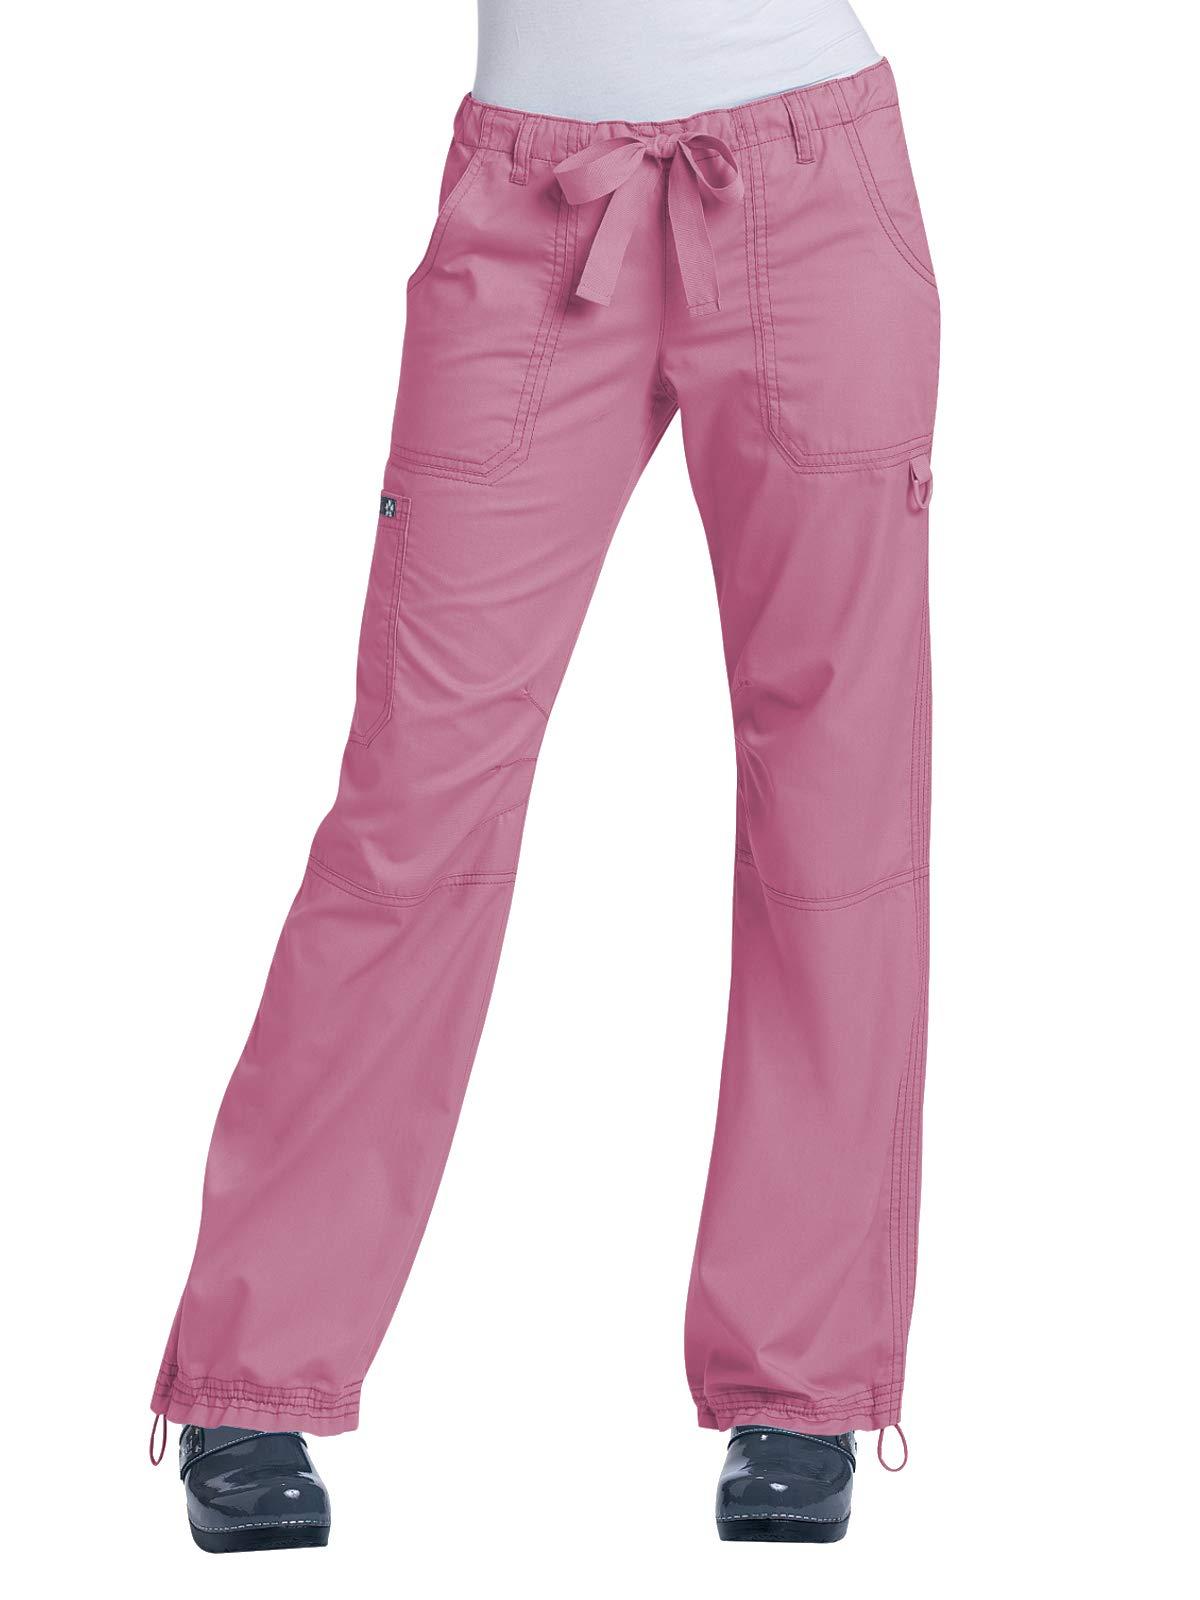 KOI Women's Lindsey Ultra Comfortable Cargo Style Scrub Pants (Petite Sizes), Pink Small